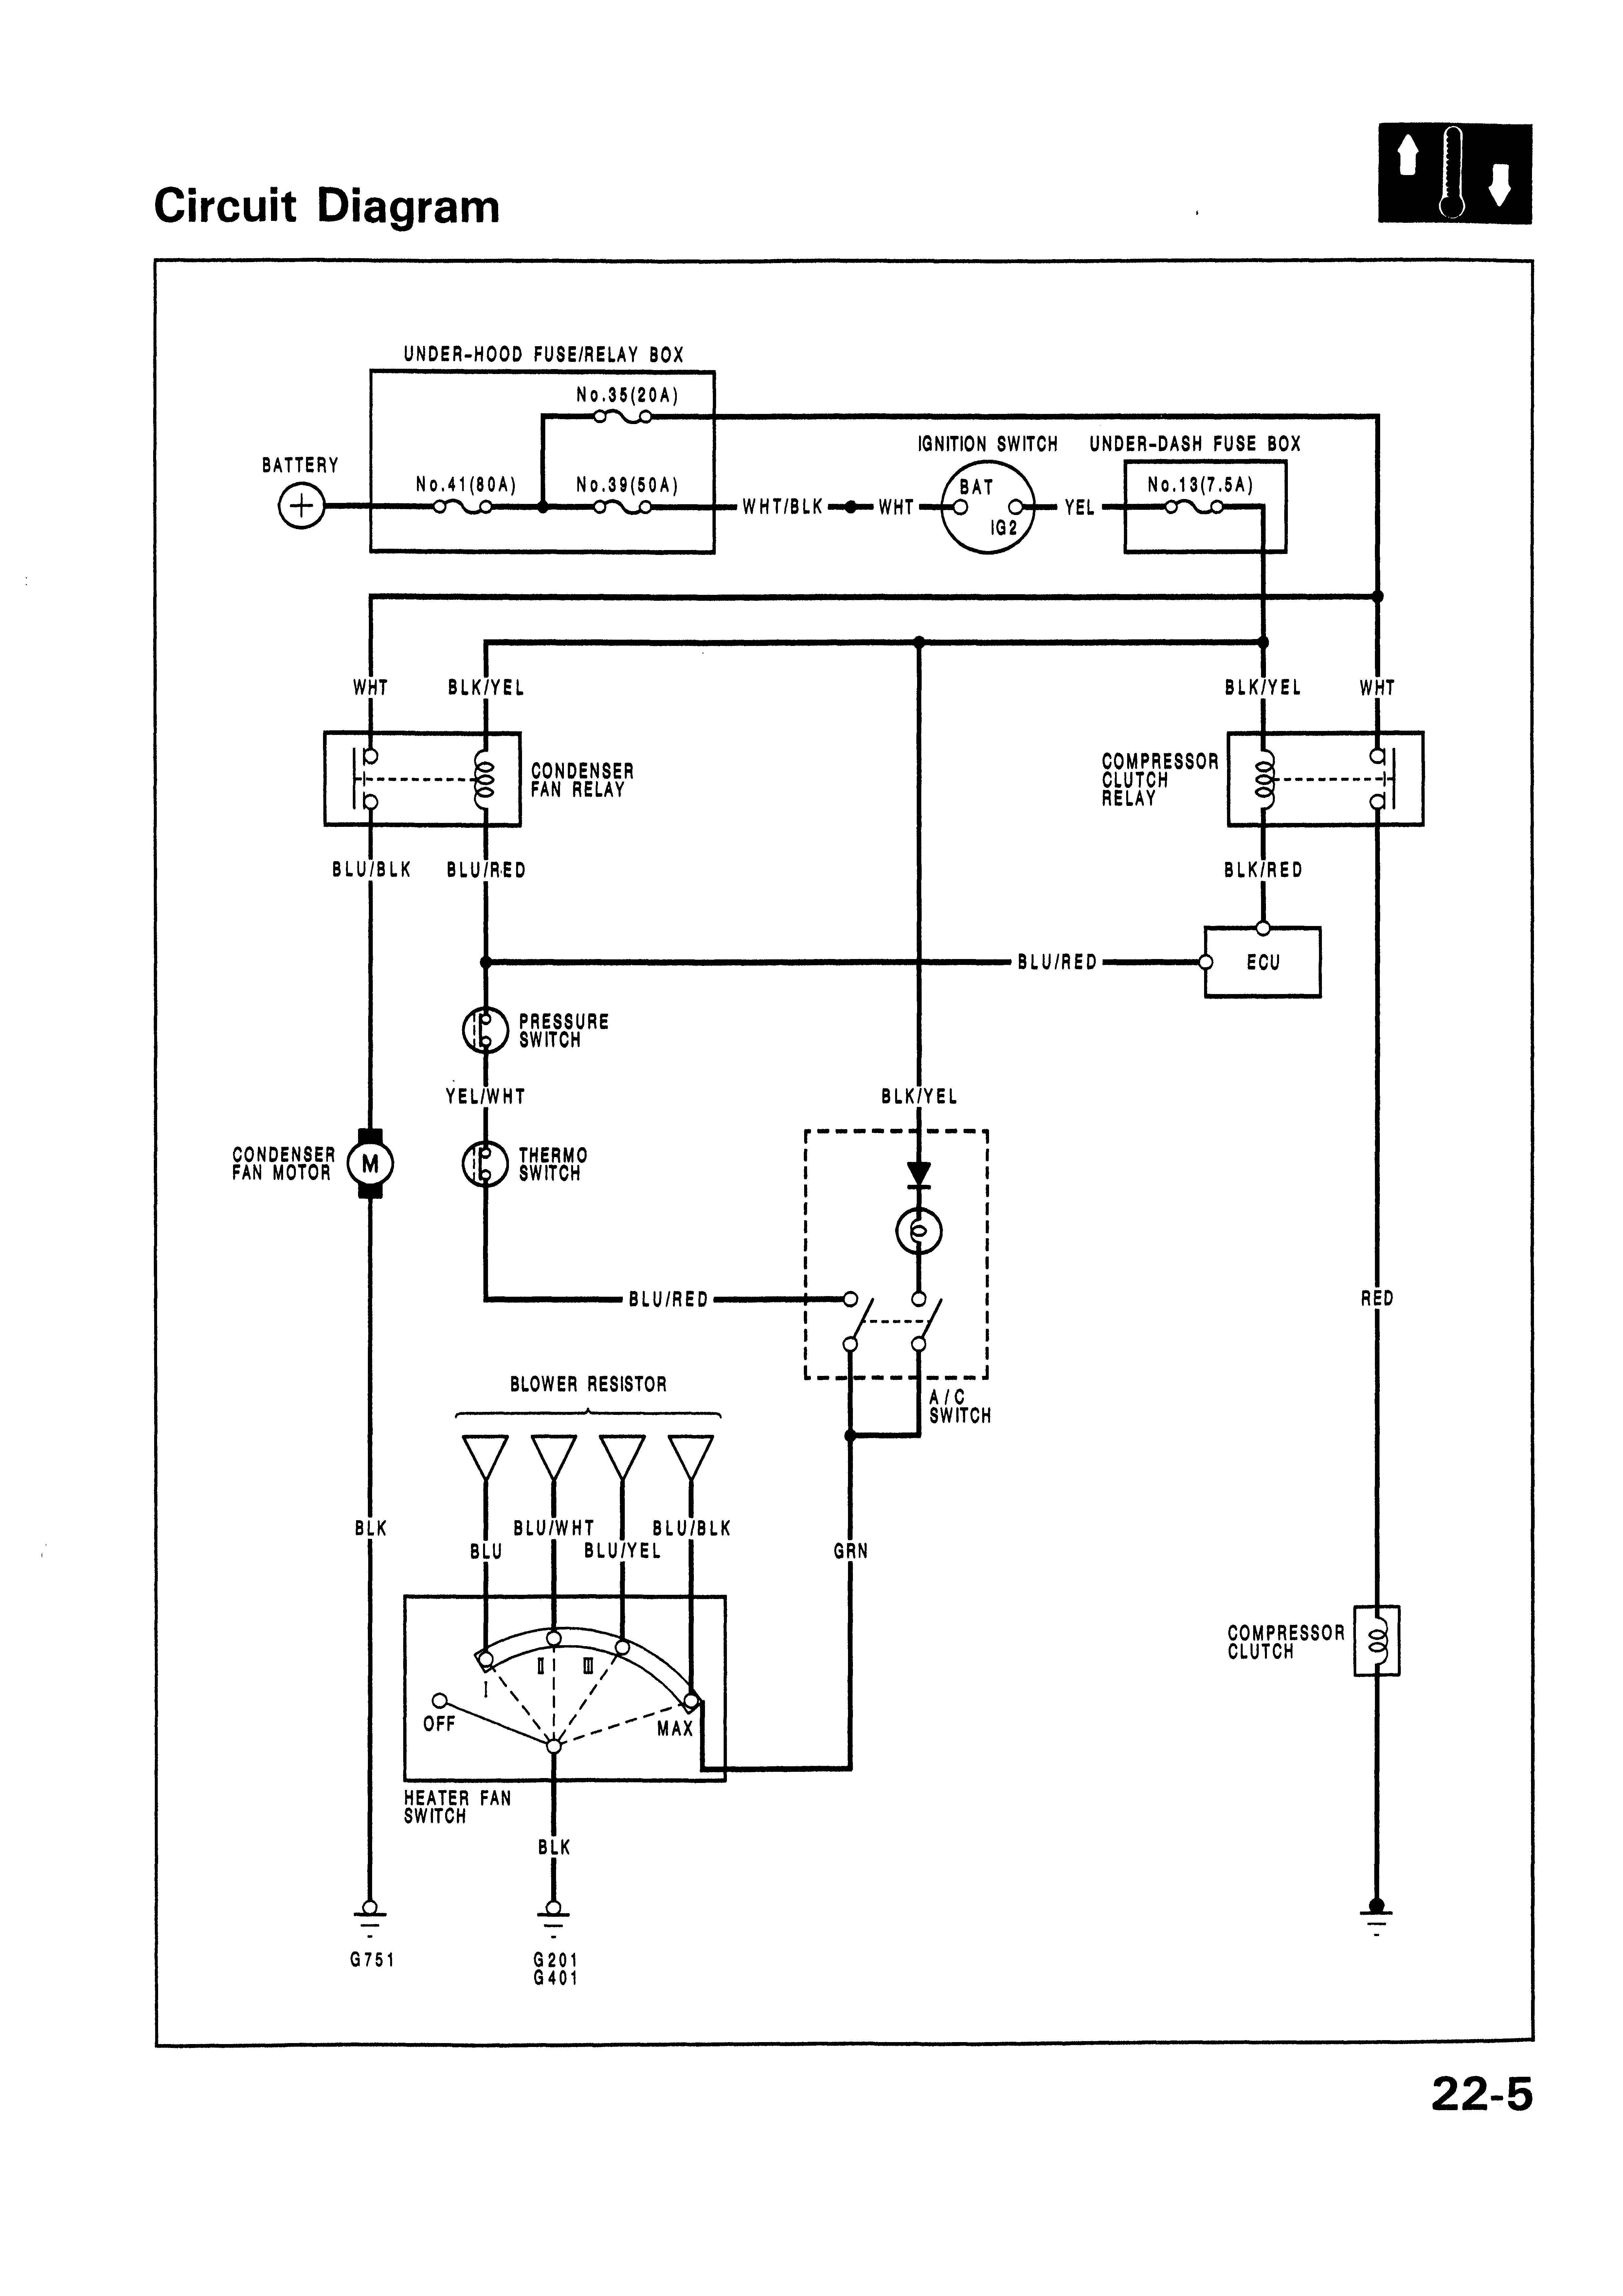 New Types Of Wirings Diagram Wiringdiagram Diagramming Diagramm Visuals Visualisation Graphical Diagram Circuit Diagram Types Of Electrical Wiring